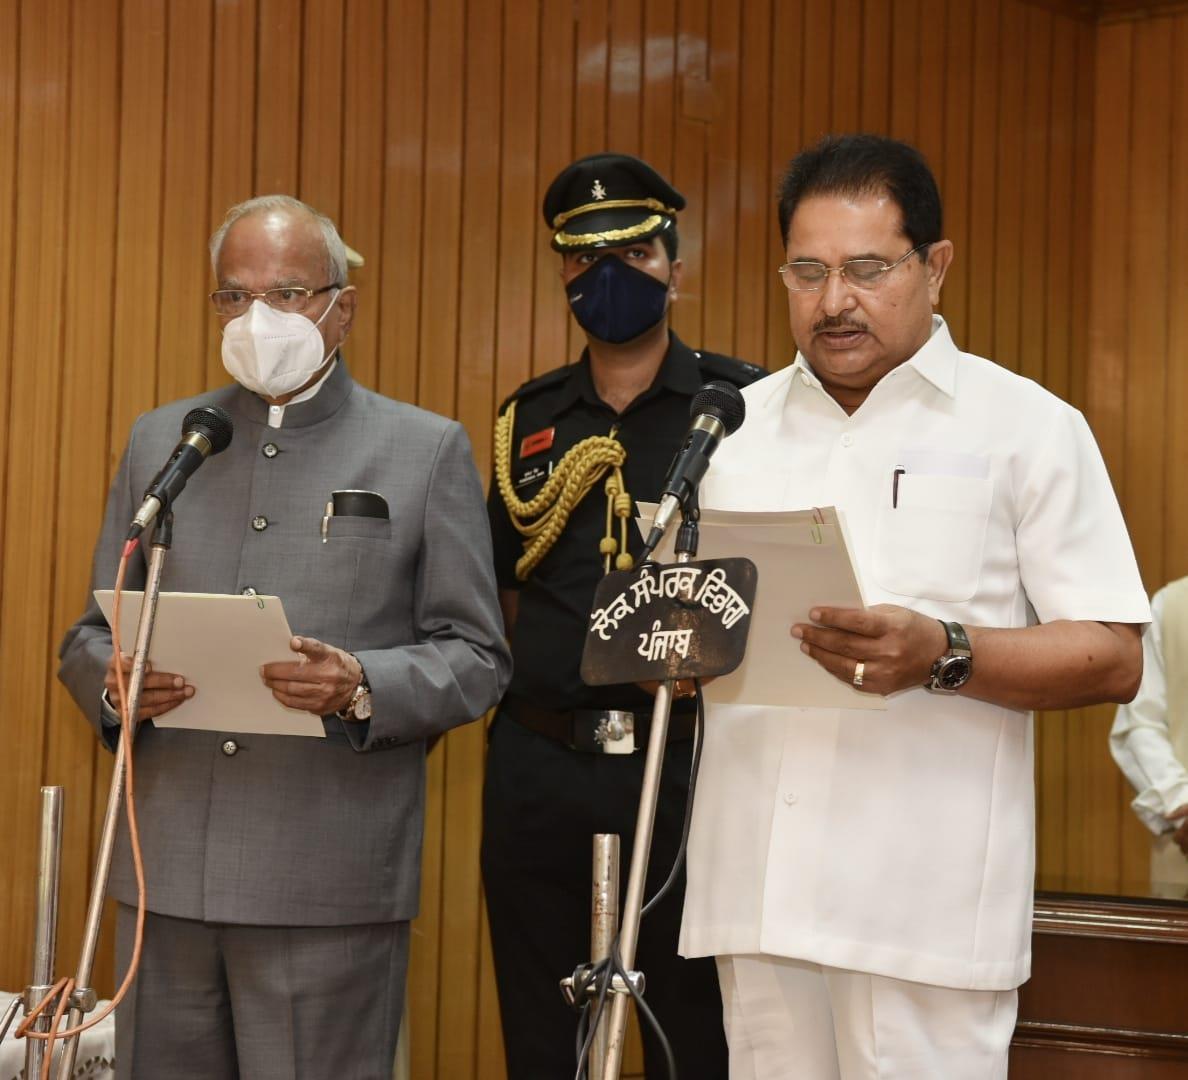 Amritsar Central MLA OP Soni was a surprise pick as deputy CM